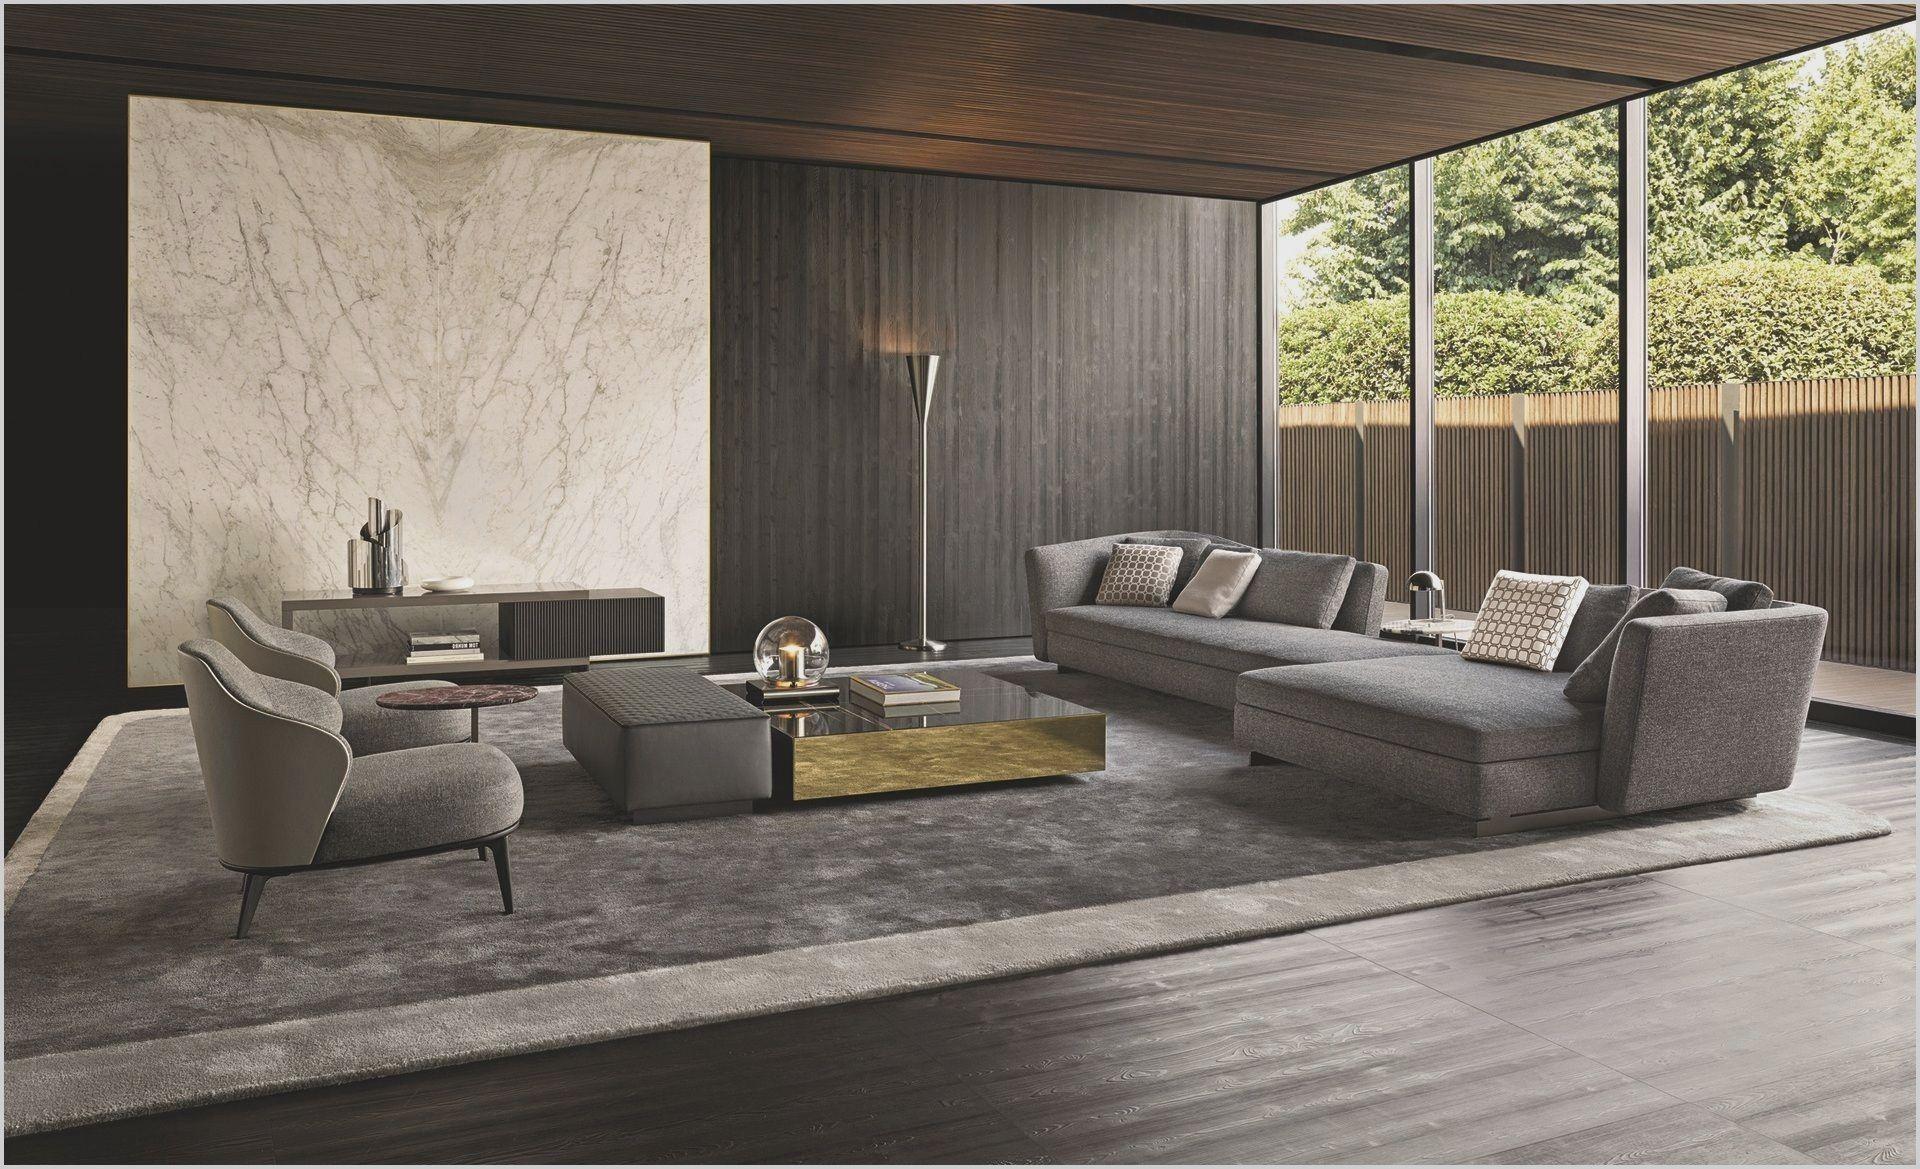 New The 10 Best Home Decor With Pictures Italianfurnitureonline Riyadh Kazakhstan Nyc Milan London Iran Abuja Newyork Italianfurniture Ch Decor